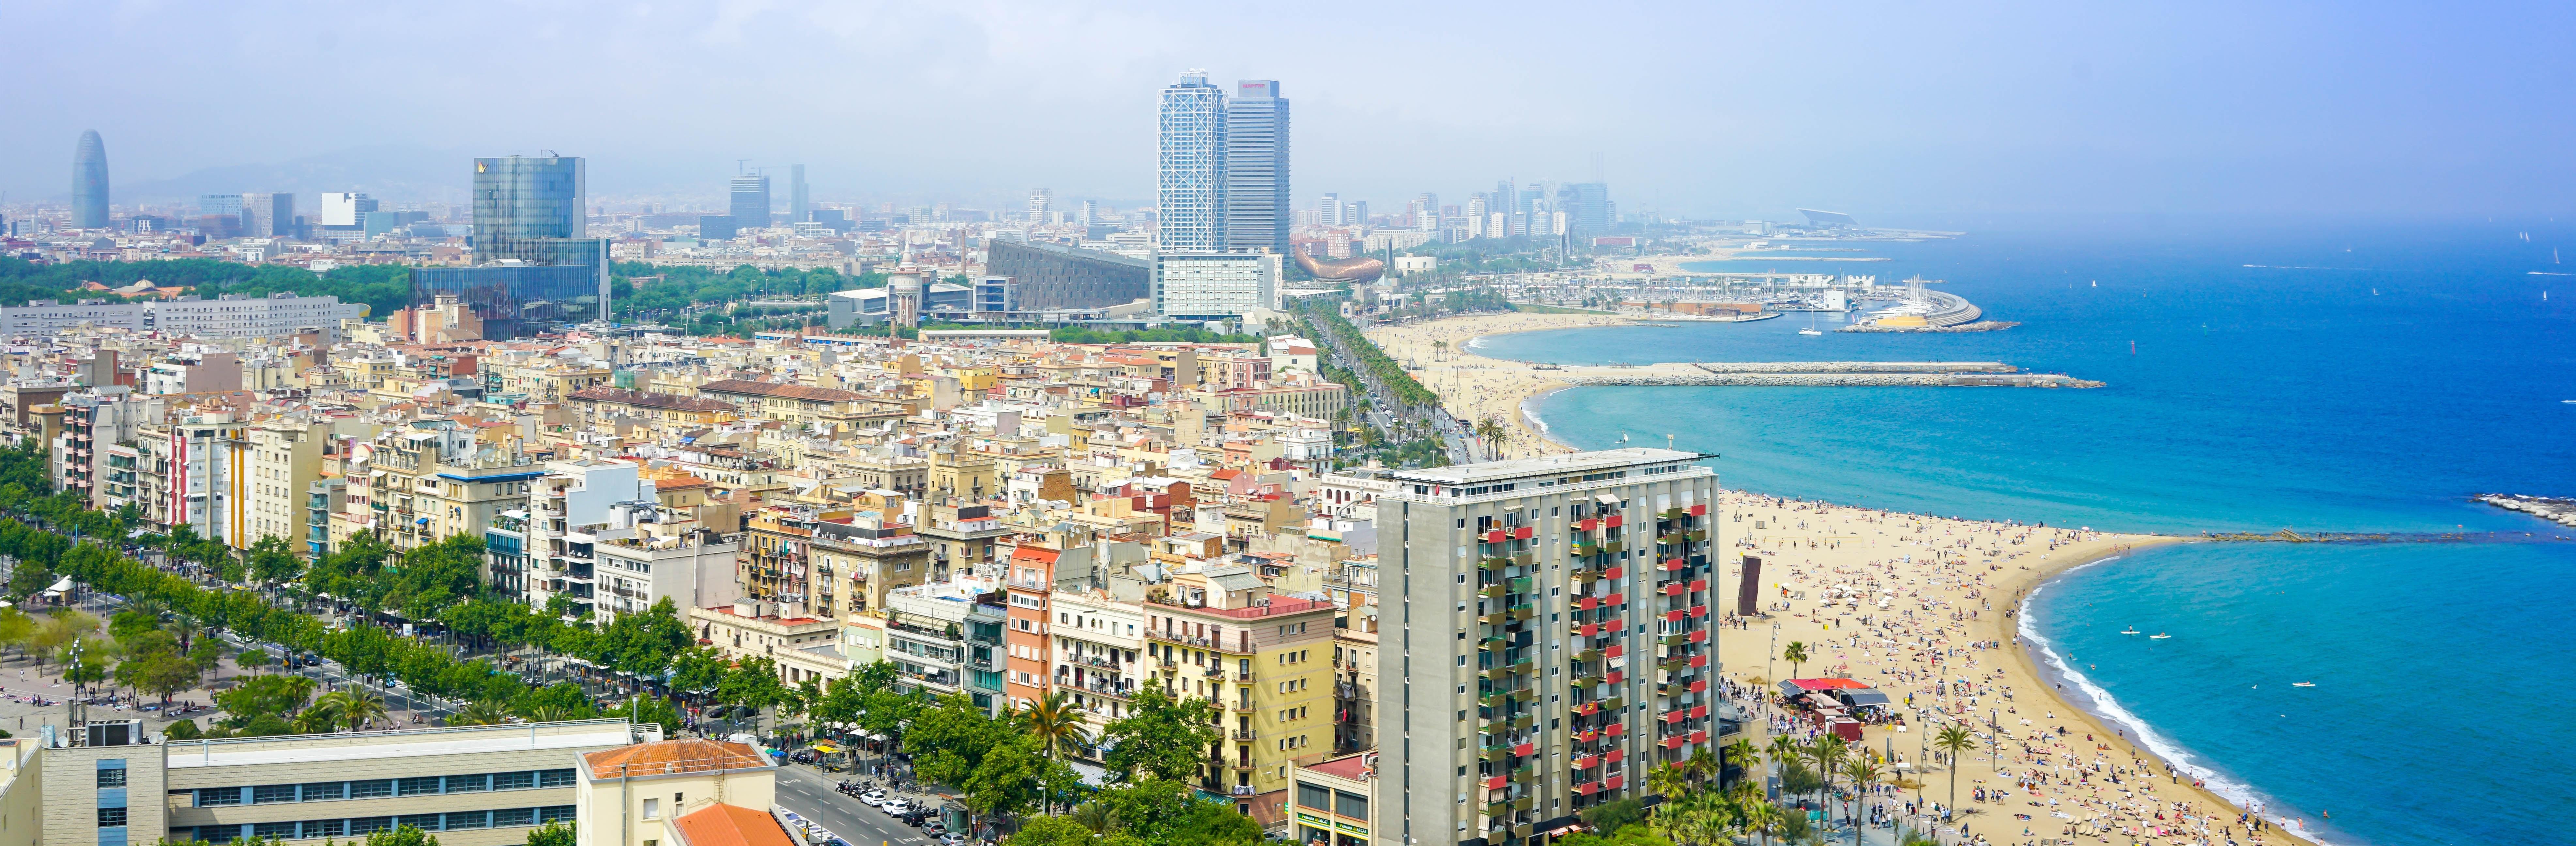 "Visitar Barcelona: 5 lugares ""escondidos"""